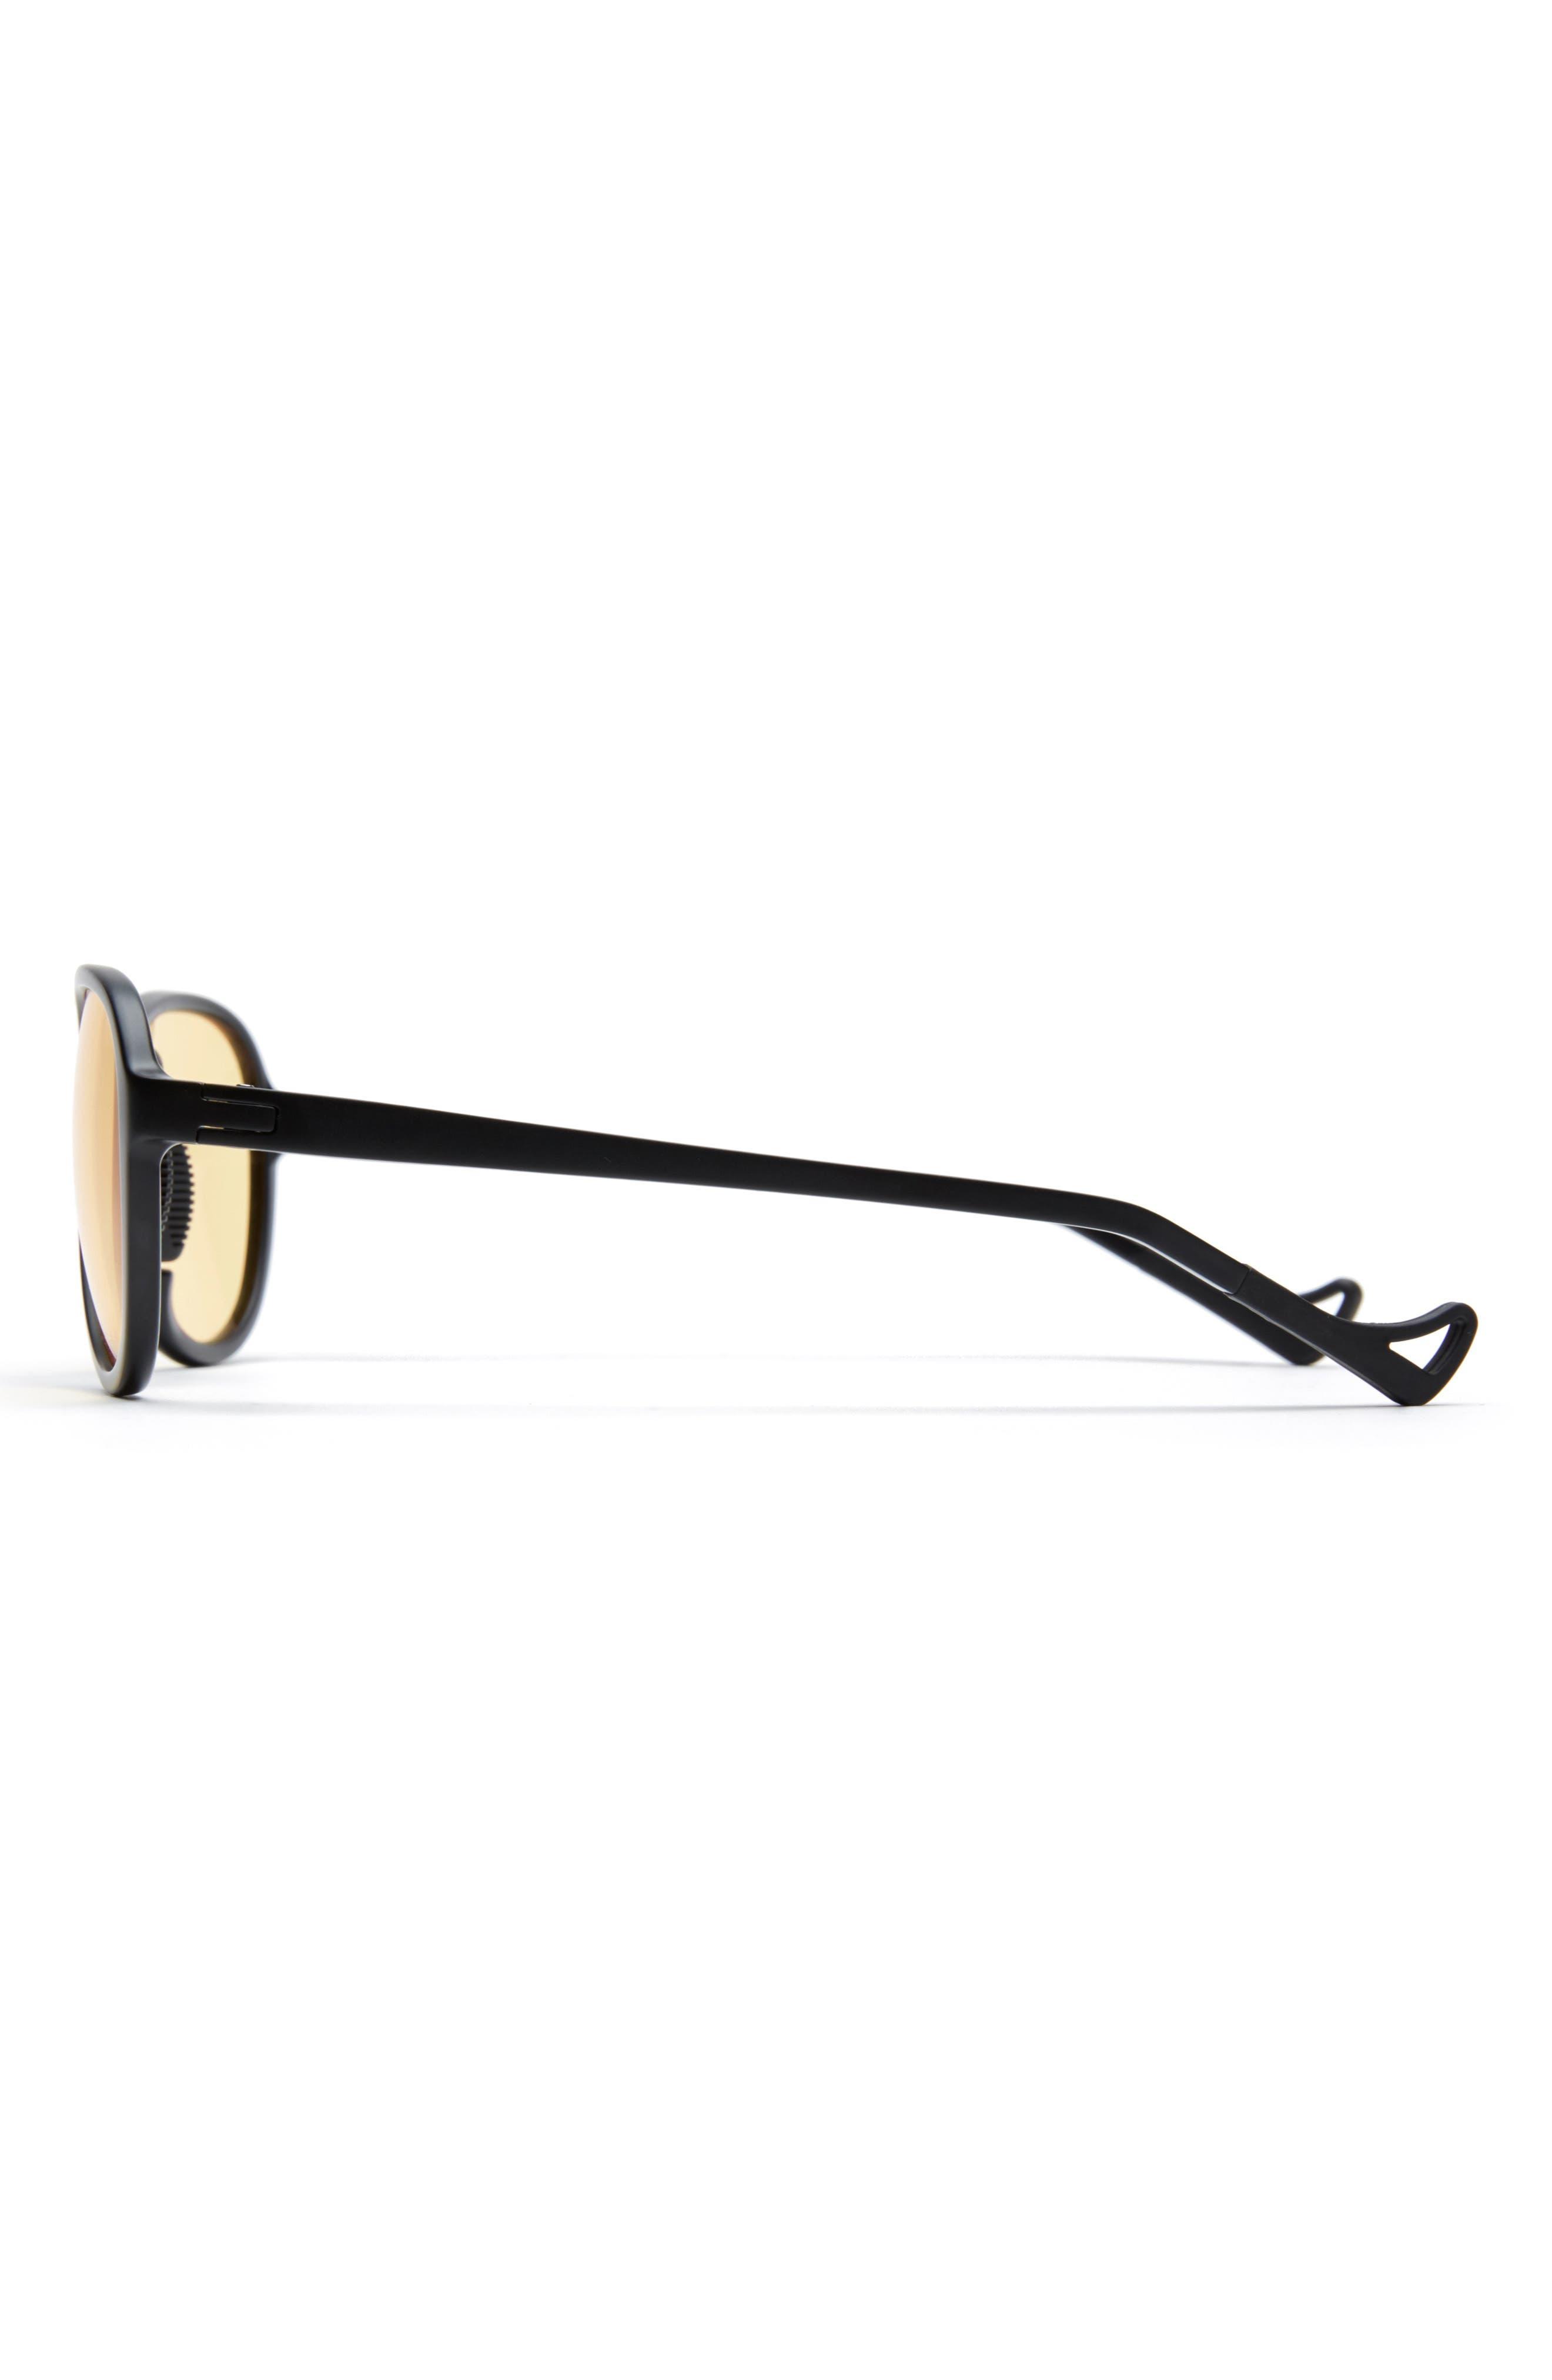 Kaishiro 51mm Sunglasses,                             Main thumbnail 1, color,                             BLACK/ YELLOW